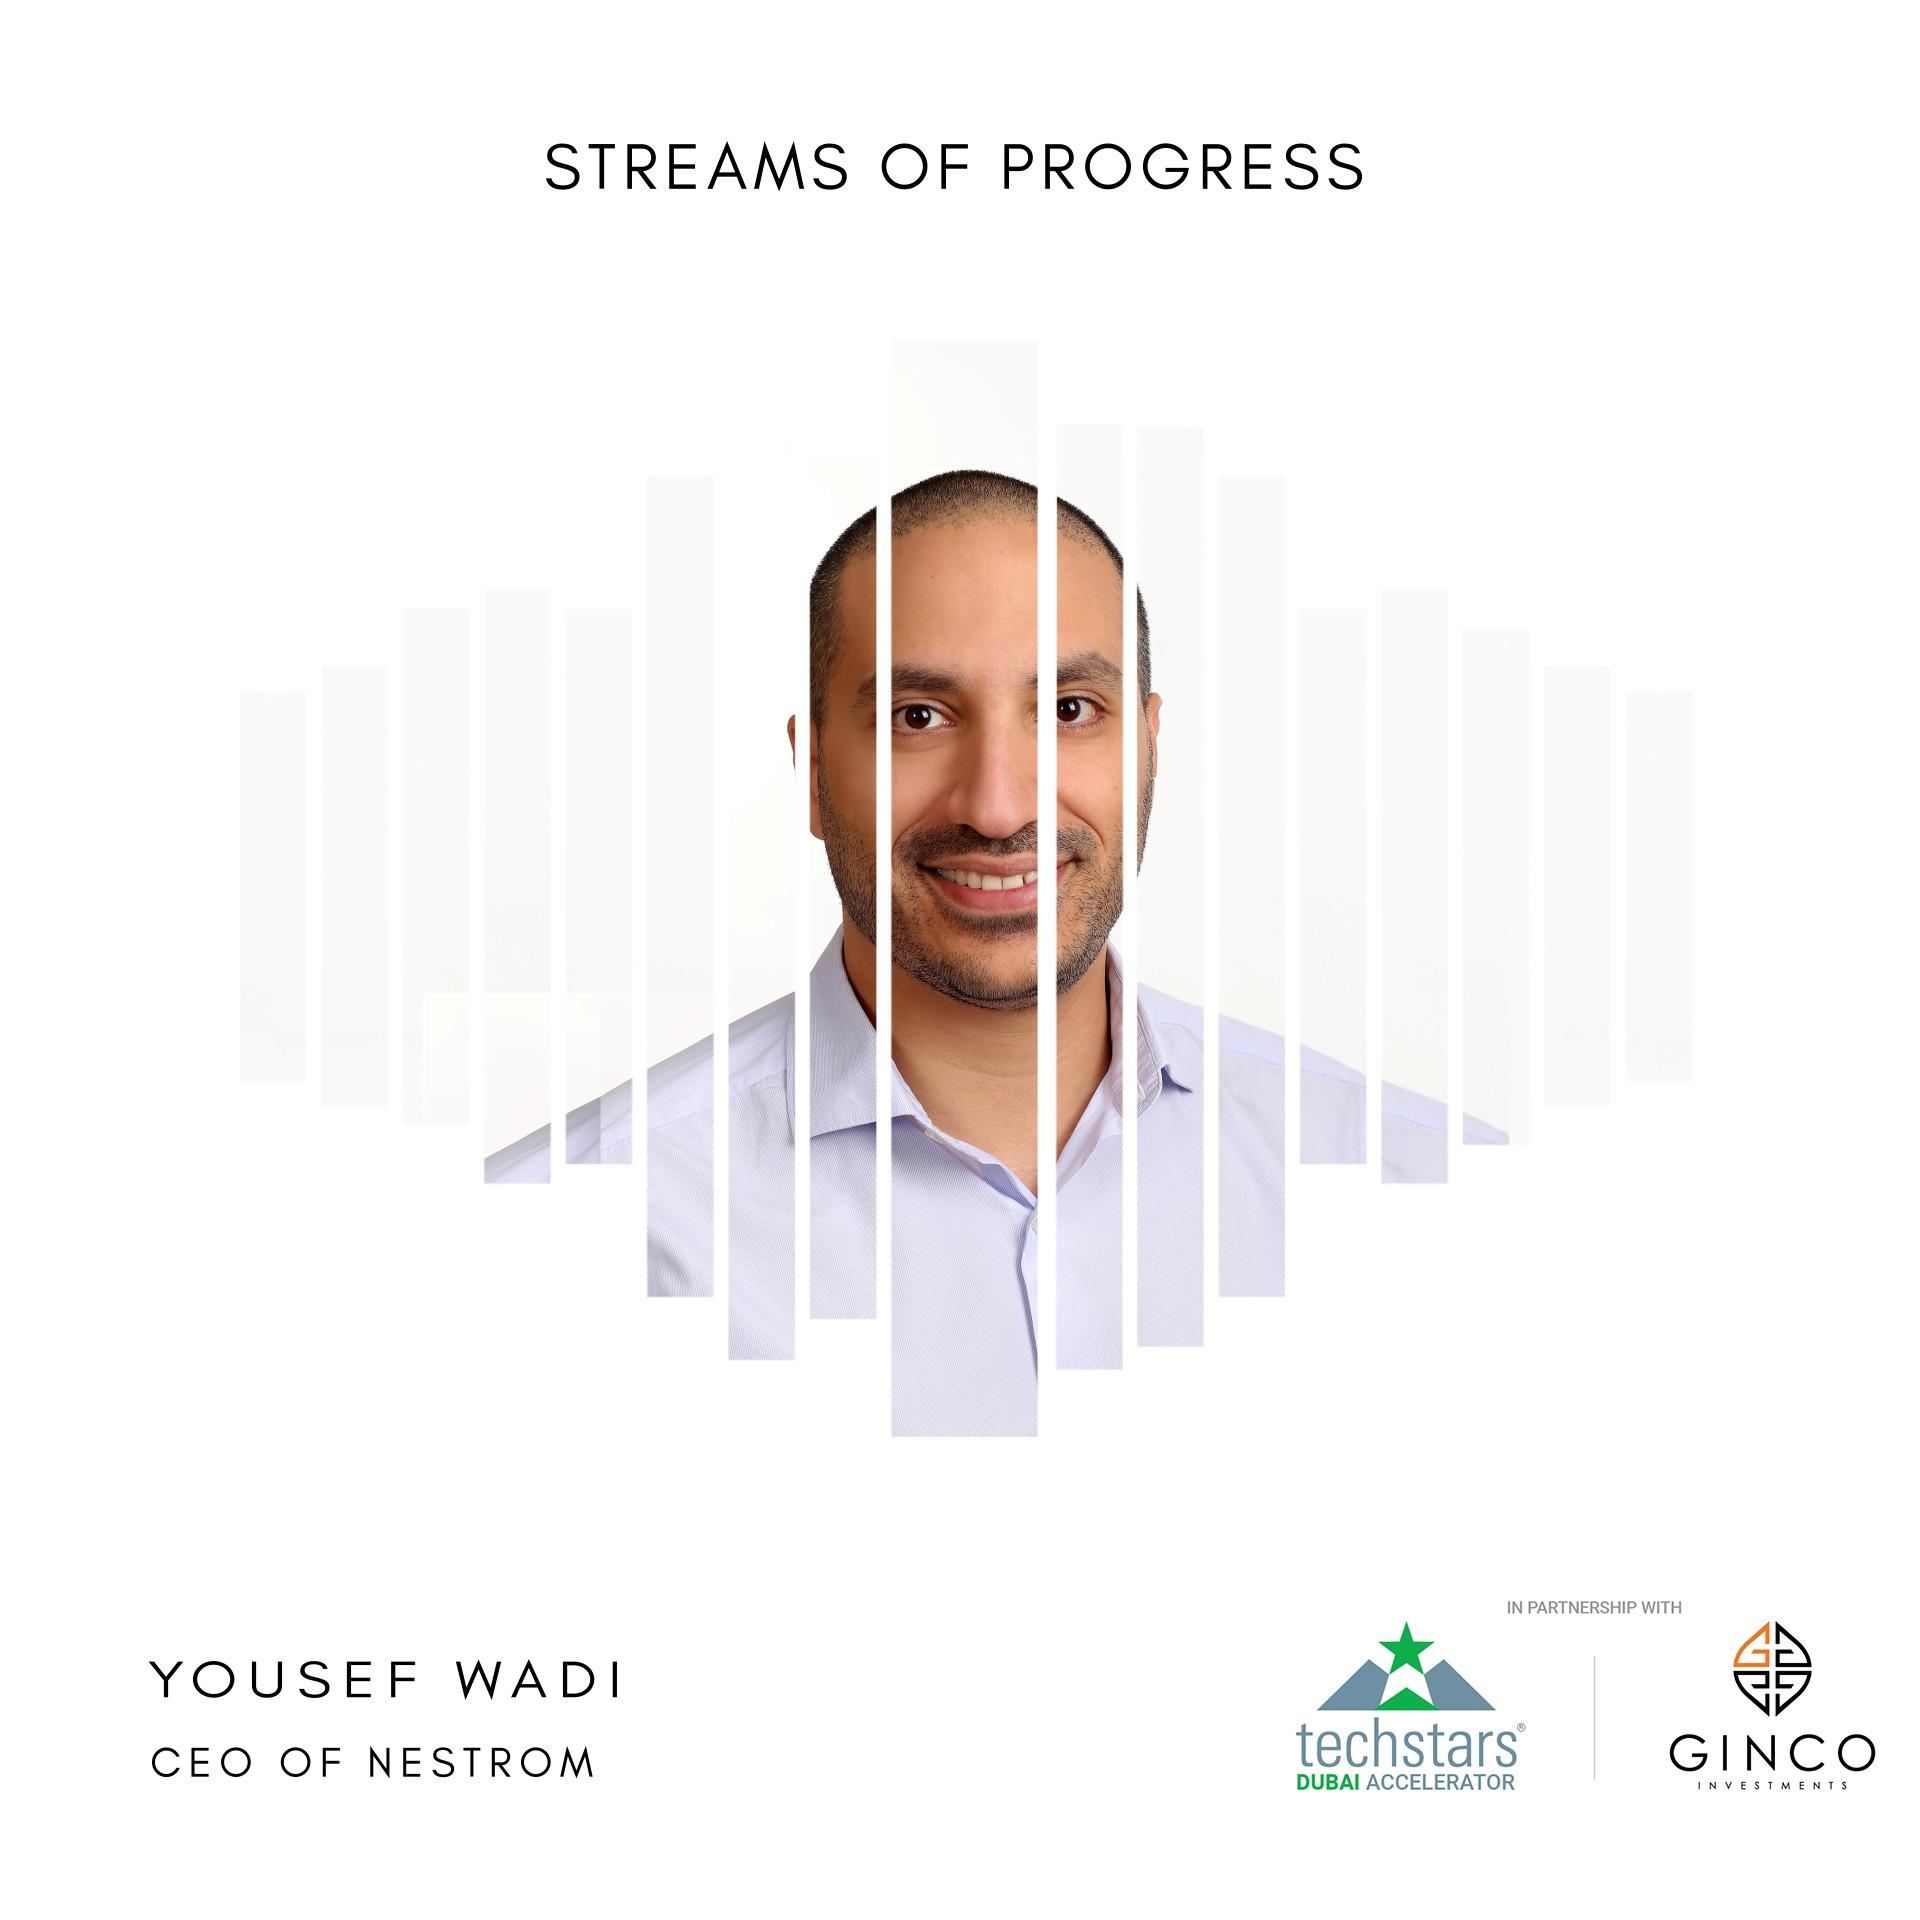 Techstars 2019 - Yousef Wafi, Nestrom